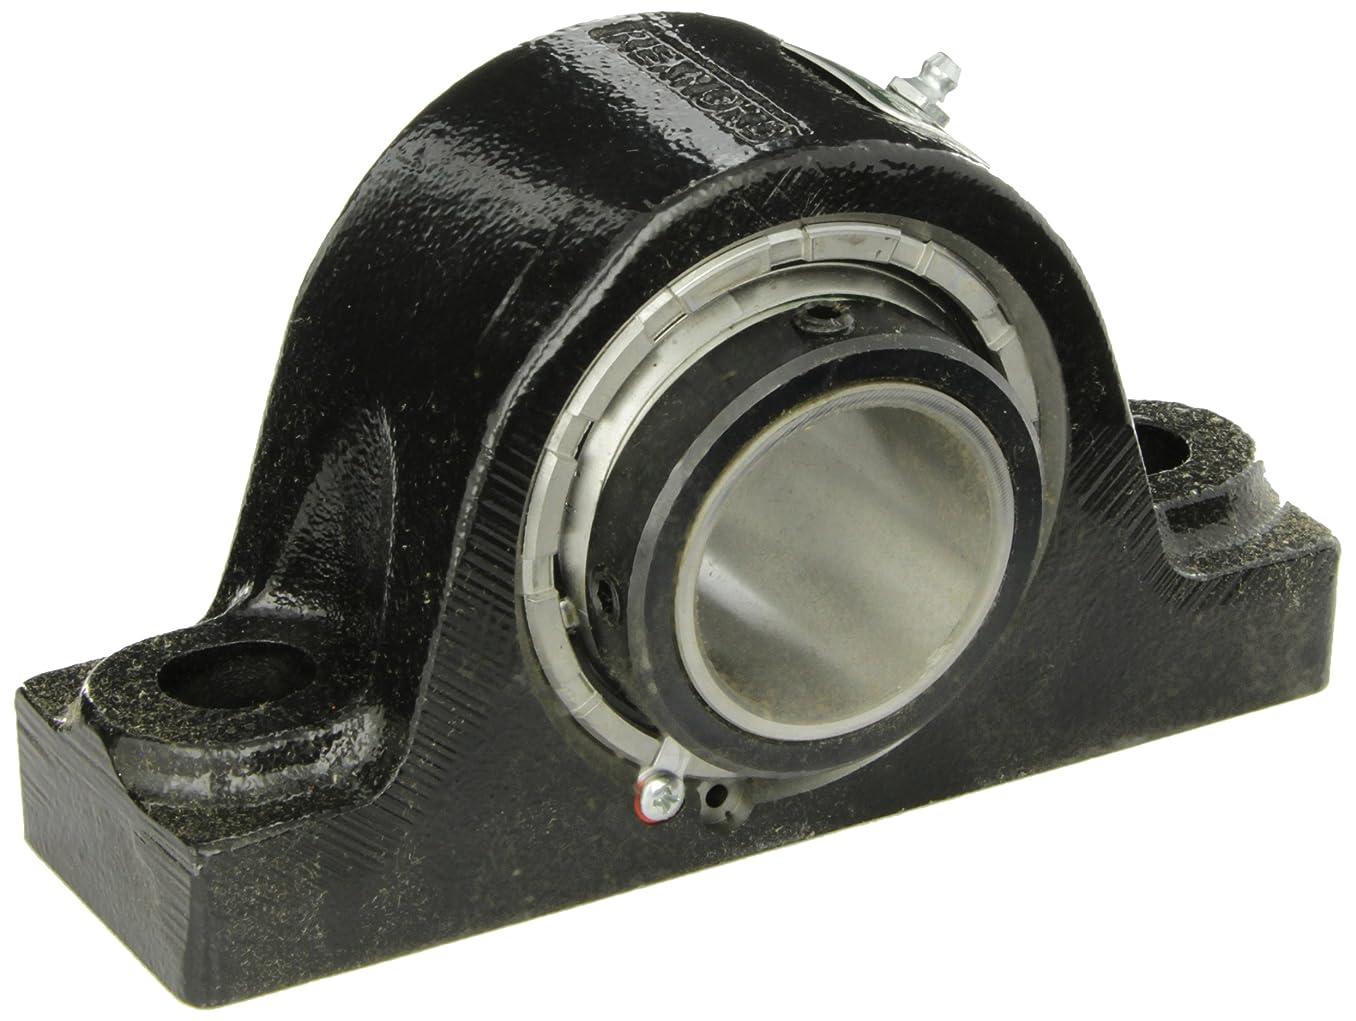 Rexnord ZA2108 Roller Bearing Pillow Block, 2 Bolt Holes, Relubricatable, Non-Expansion, Cast Iron, Setscrew Locking Collar, Steel Insert, Inch, 1-1/2